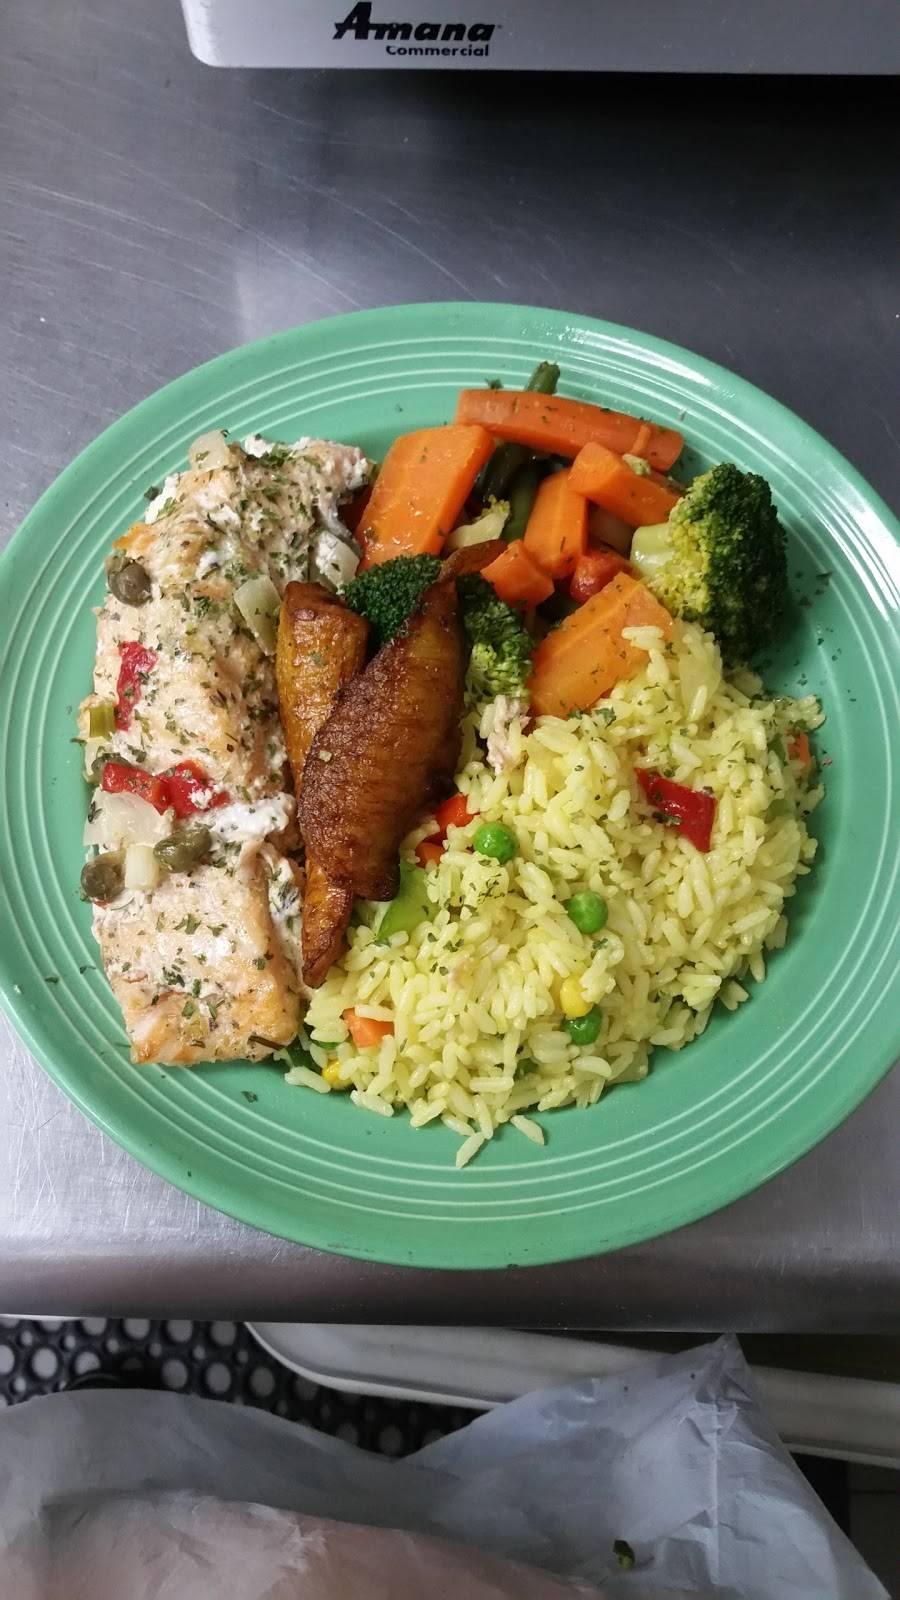 Seven Spices | restaurant | 906 E Gun Hill Rd, Bronx, NY 10469, USA | 3473268646 OR +1 347-326-8646